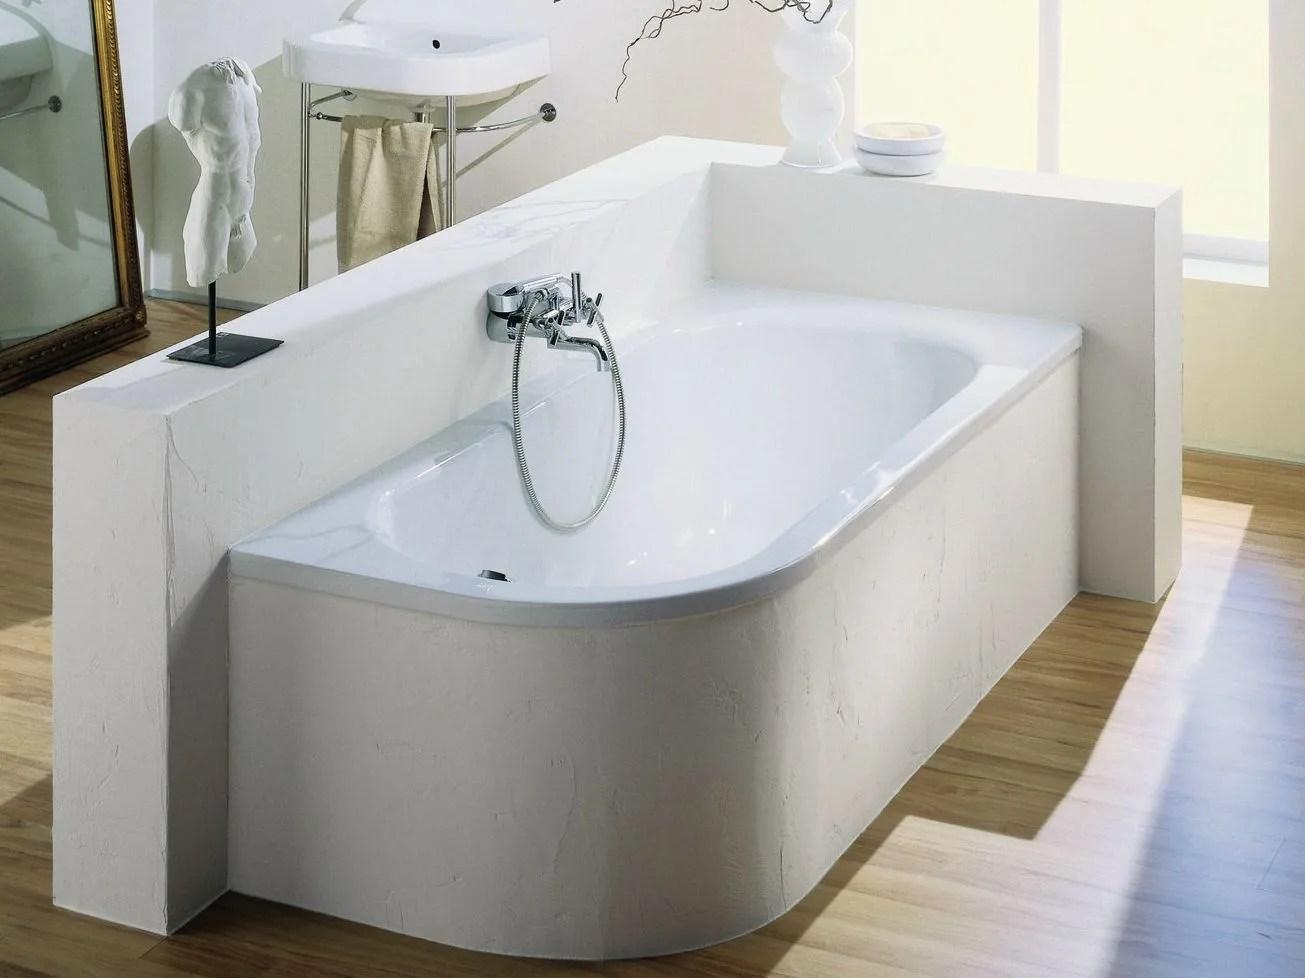 badewannen hersteller liste ka freistehende badewanne by ForBadewannen Hersteller Liste